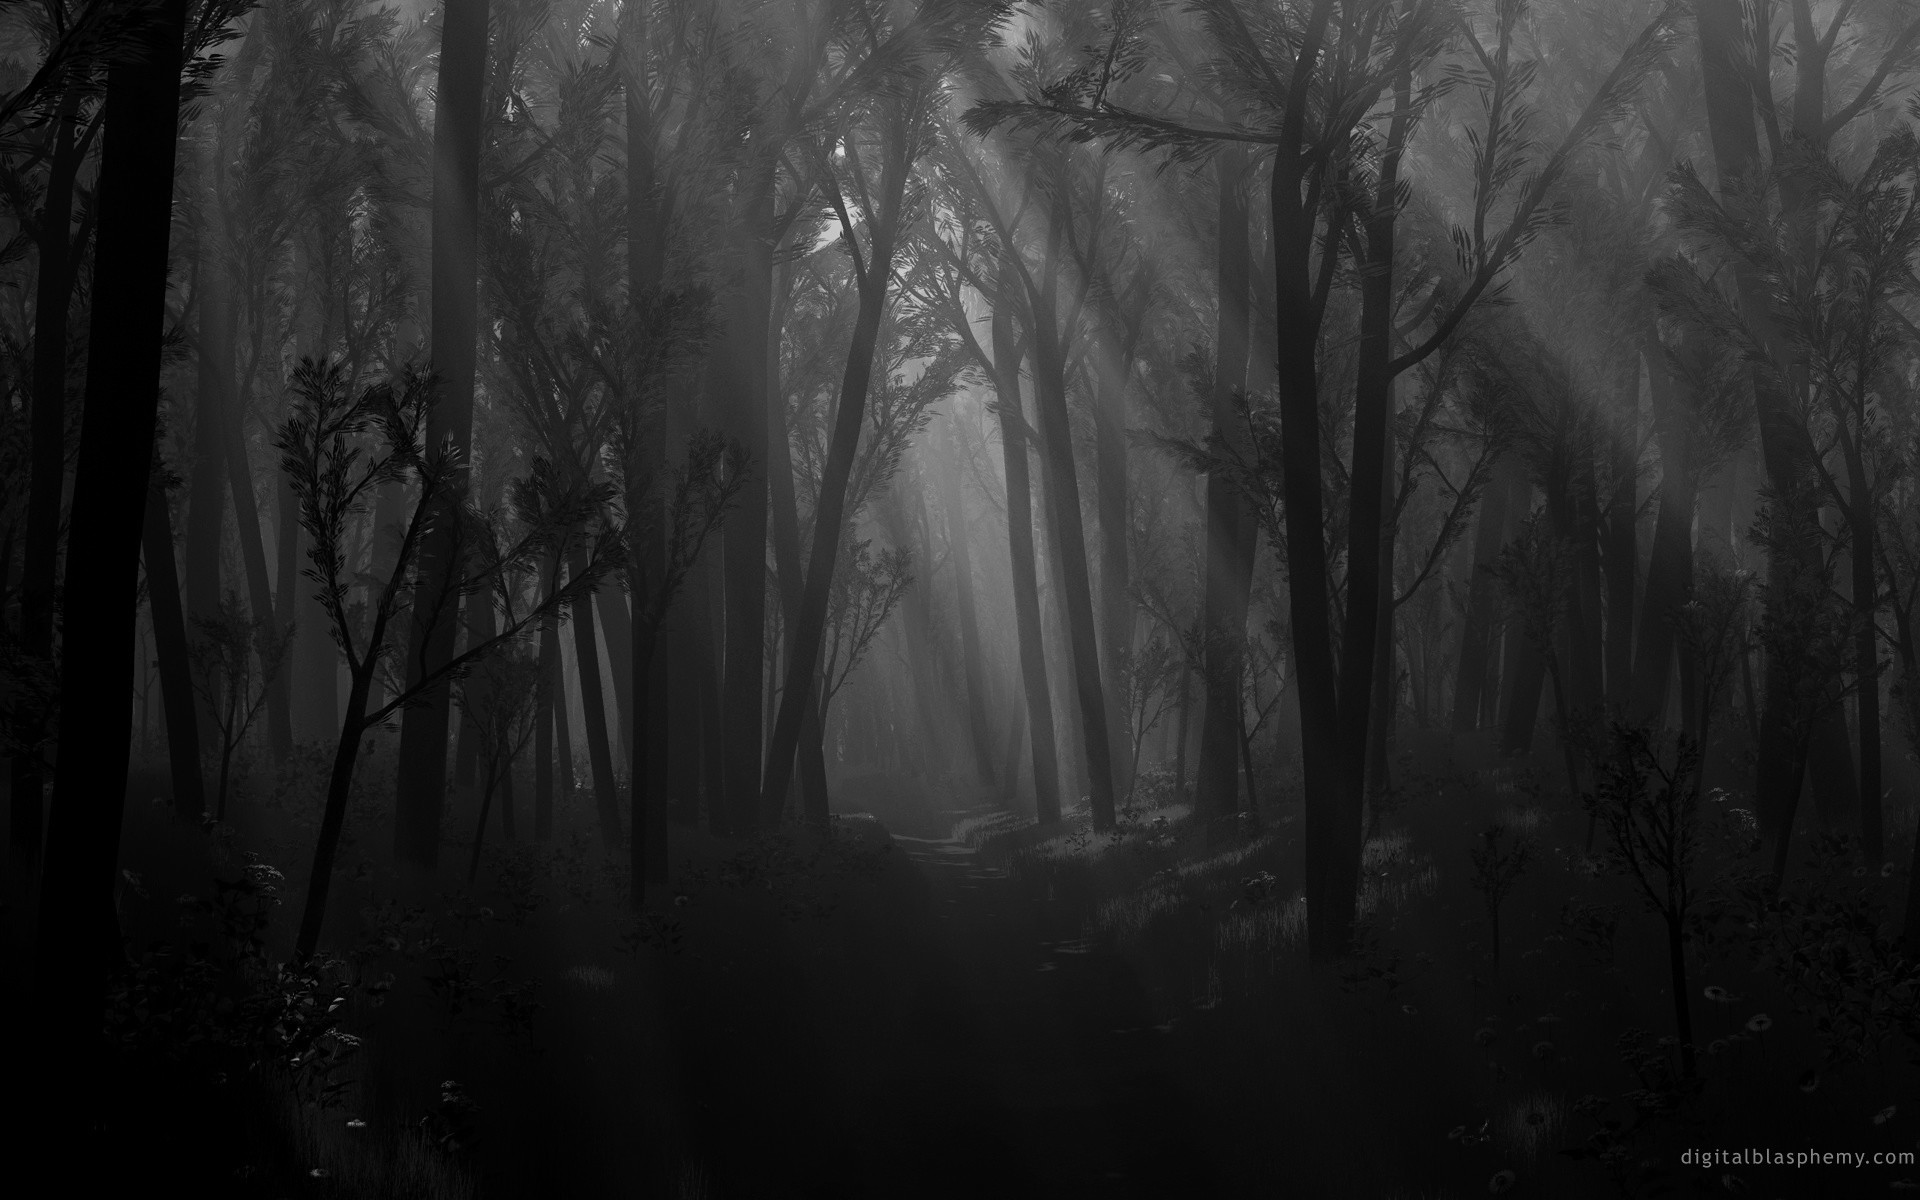 Dark Black and White Wallpaper | … in the dark forest via garganta he